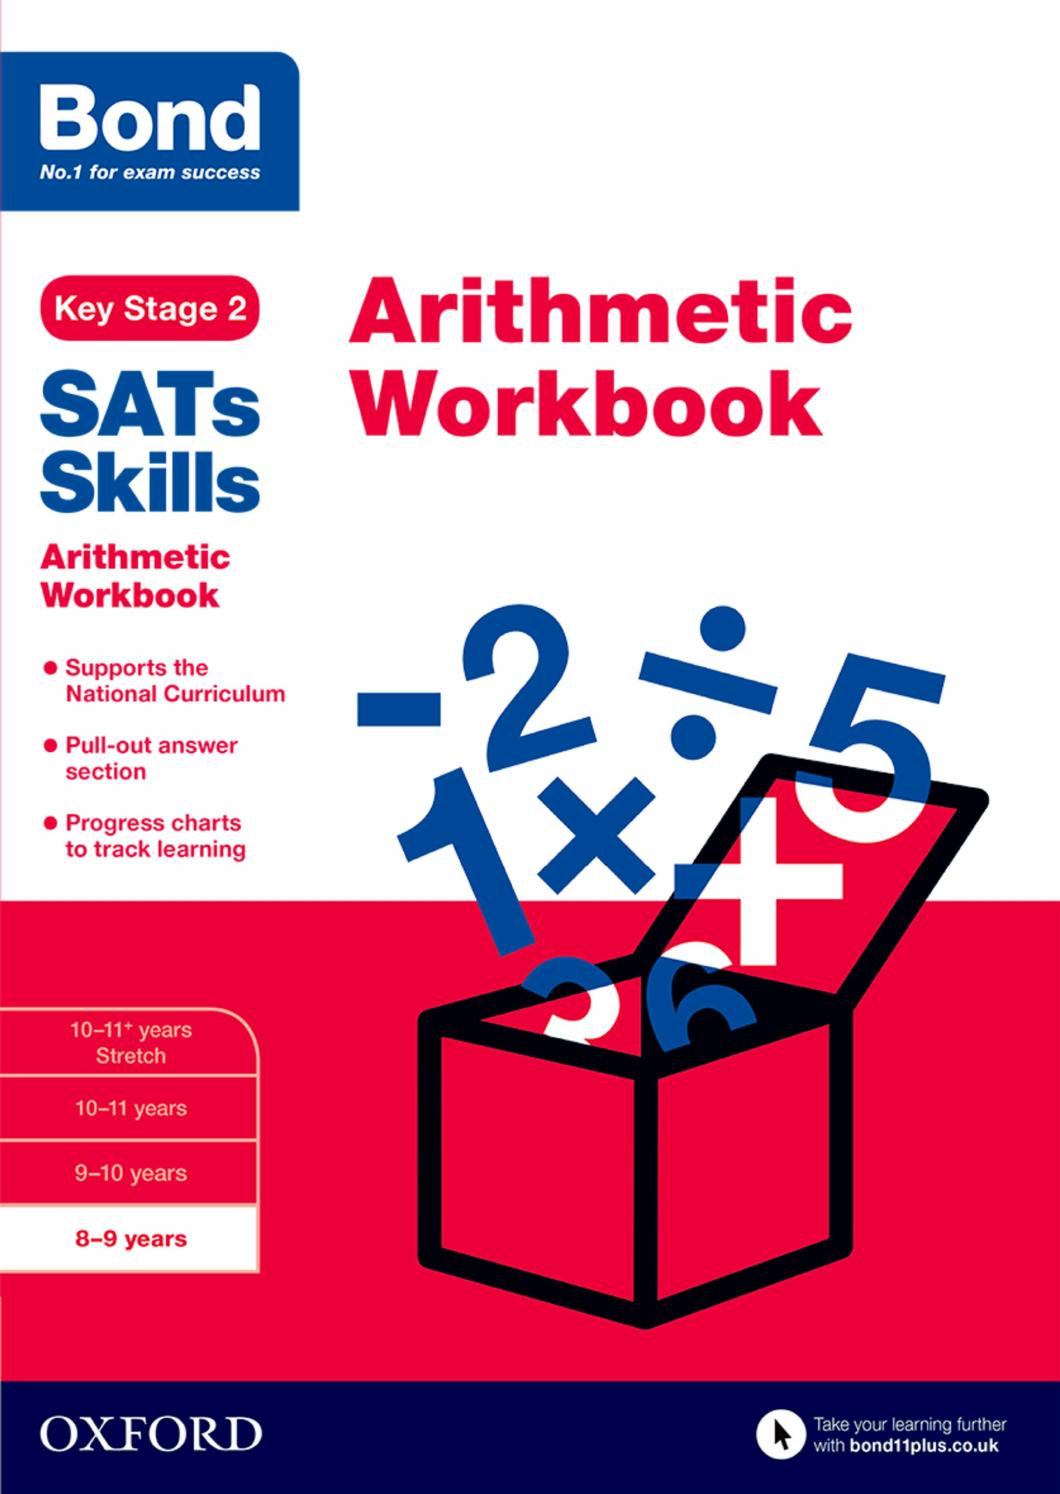 Workbooks key stage 2 workbooks : Bond SATs Skills: Arithmetic Workbook :8-9 years by Oxford ...